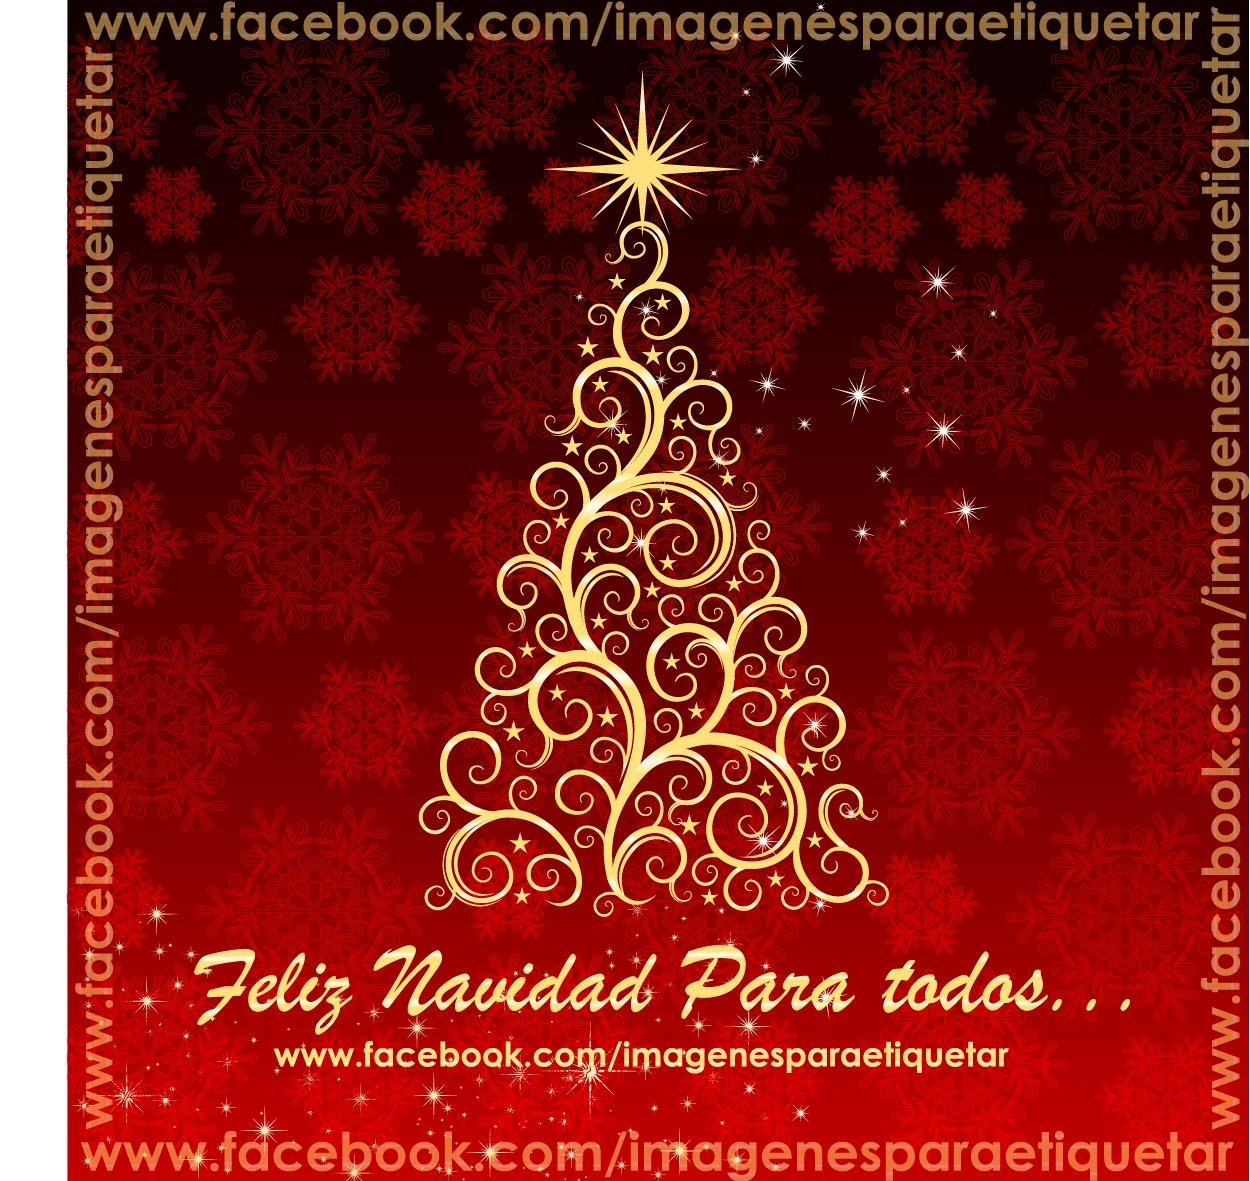 Tarjetas Cumpleanos Cristianas Cake Ideas and Designs